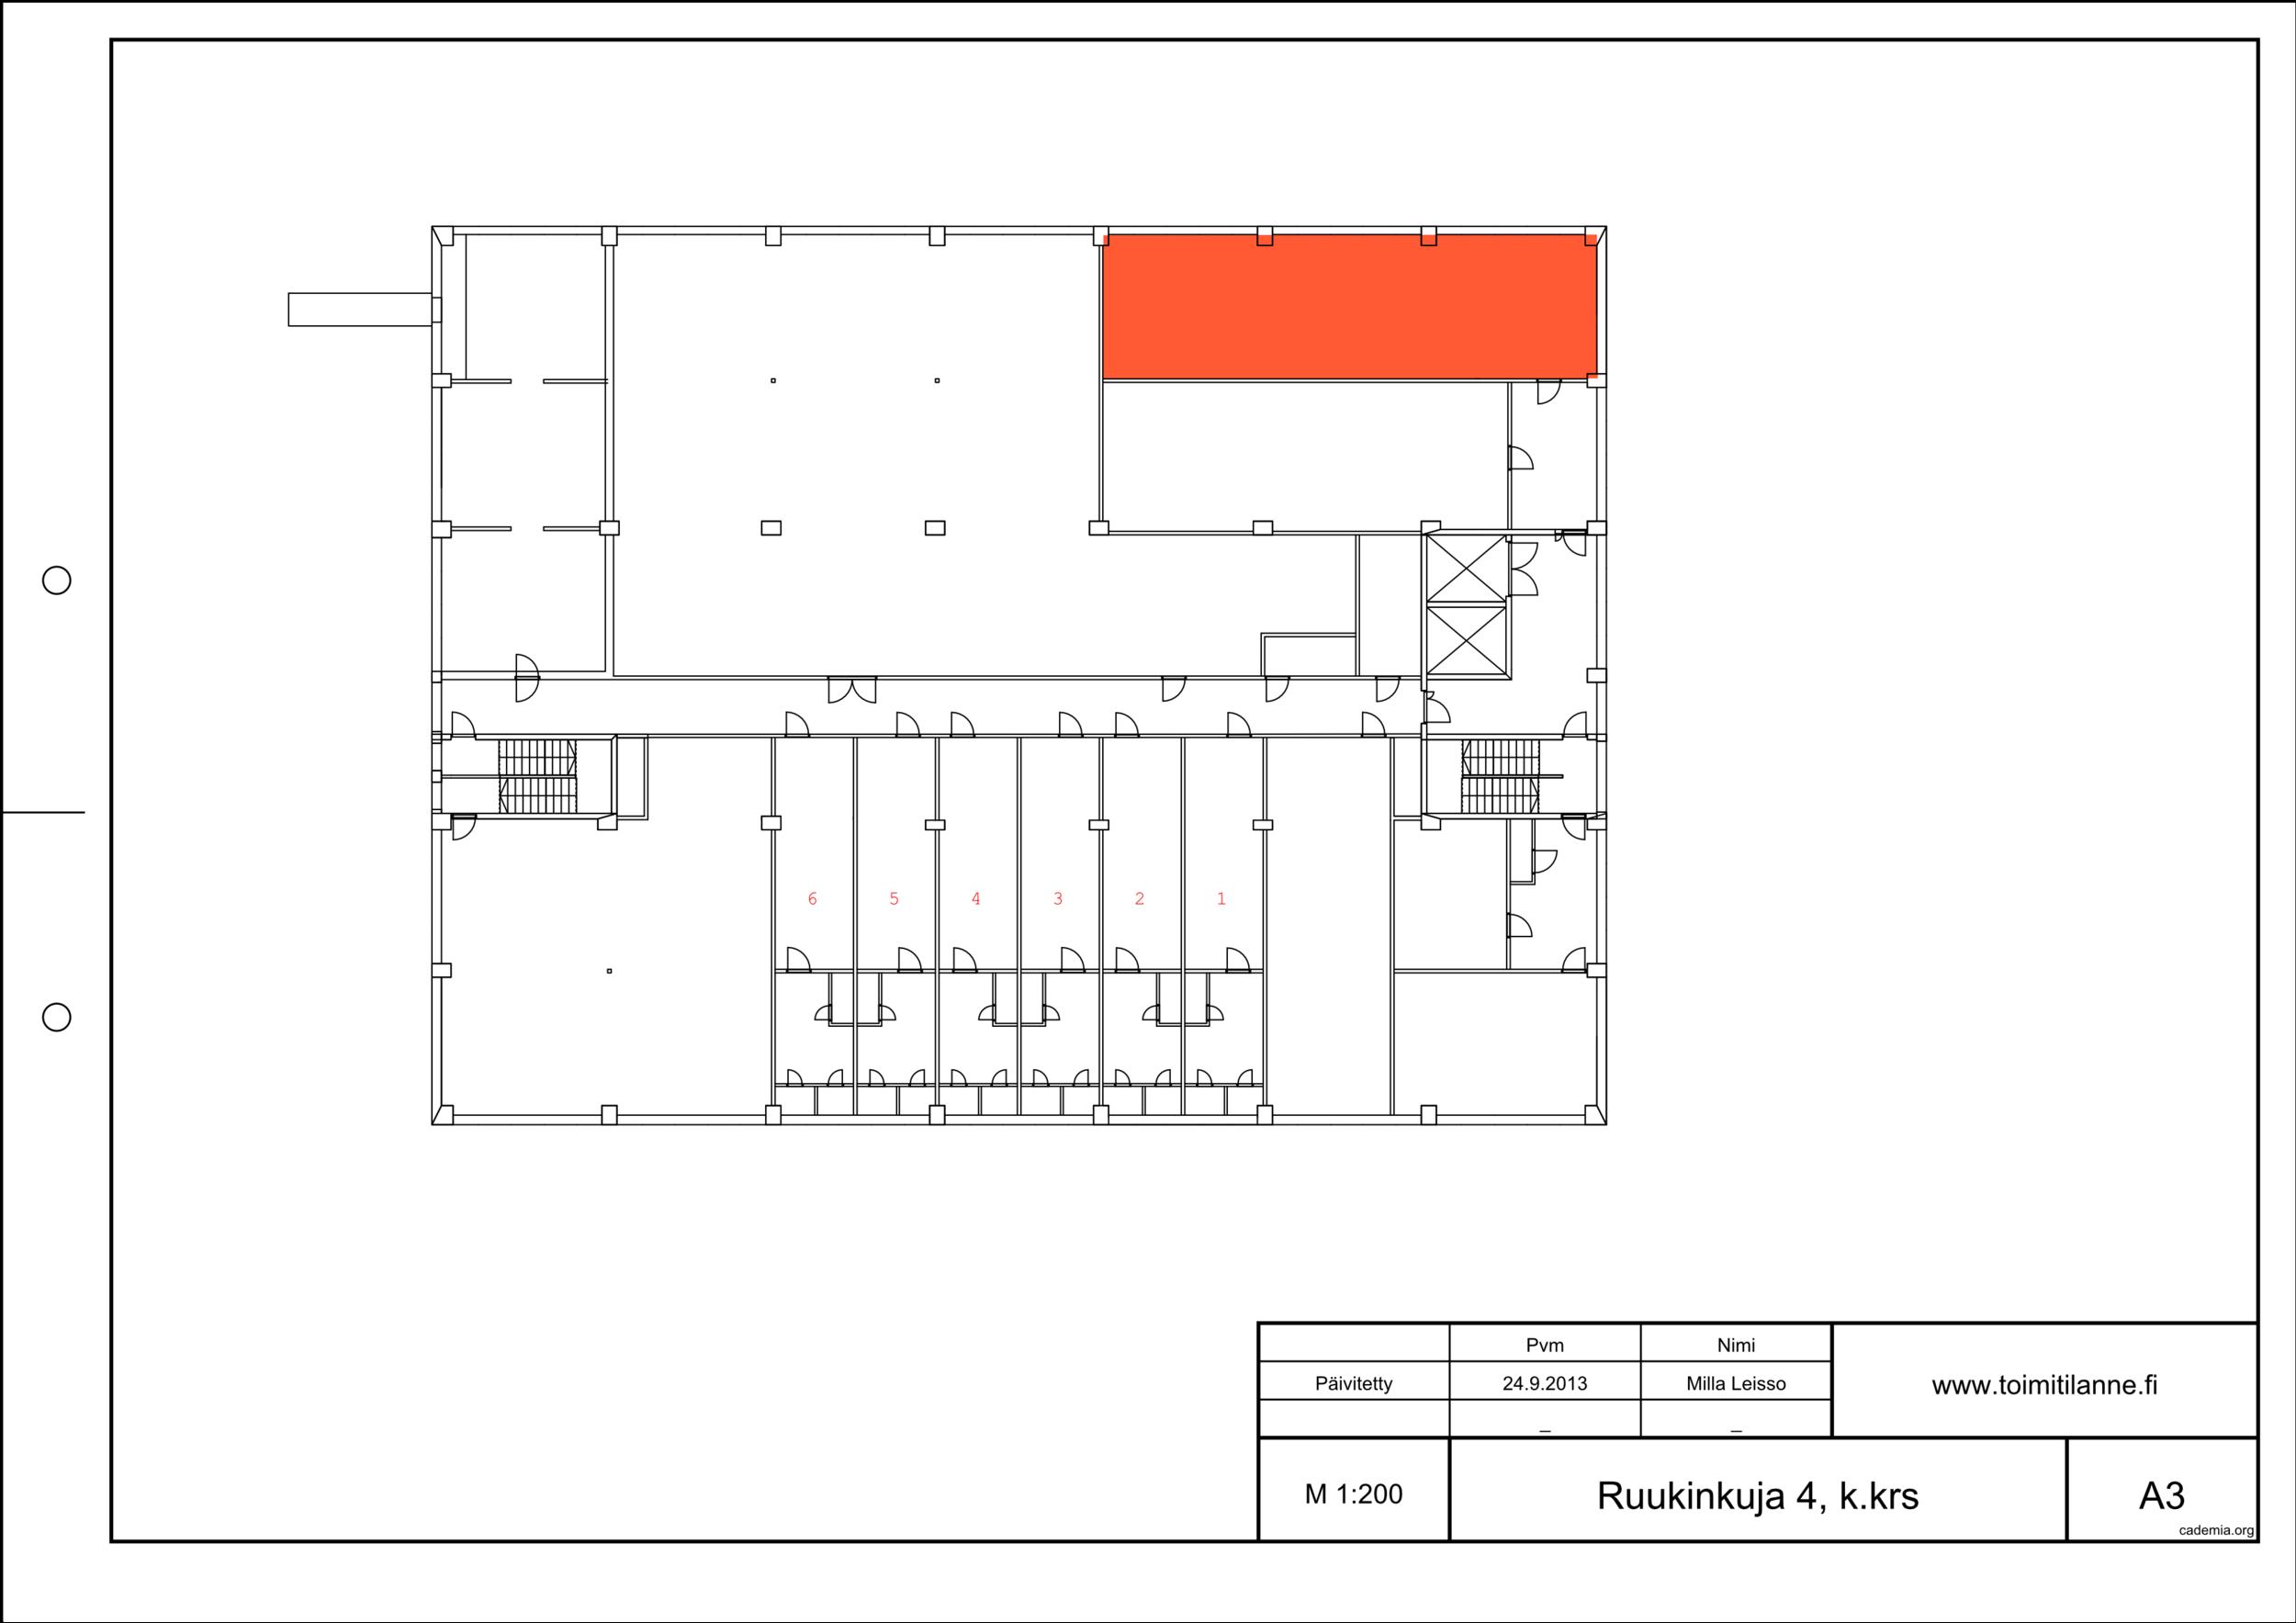 Toimitilanne Suomi, Espoo - Kiviruukki, Ruukinkuja 4, Varastotila 96 m²